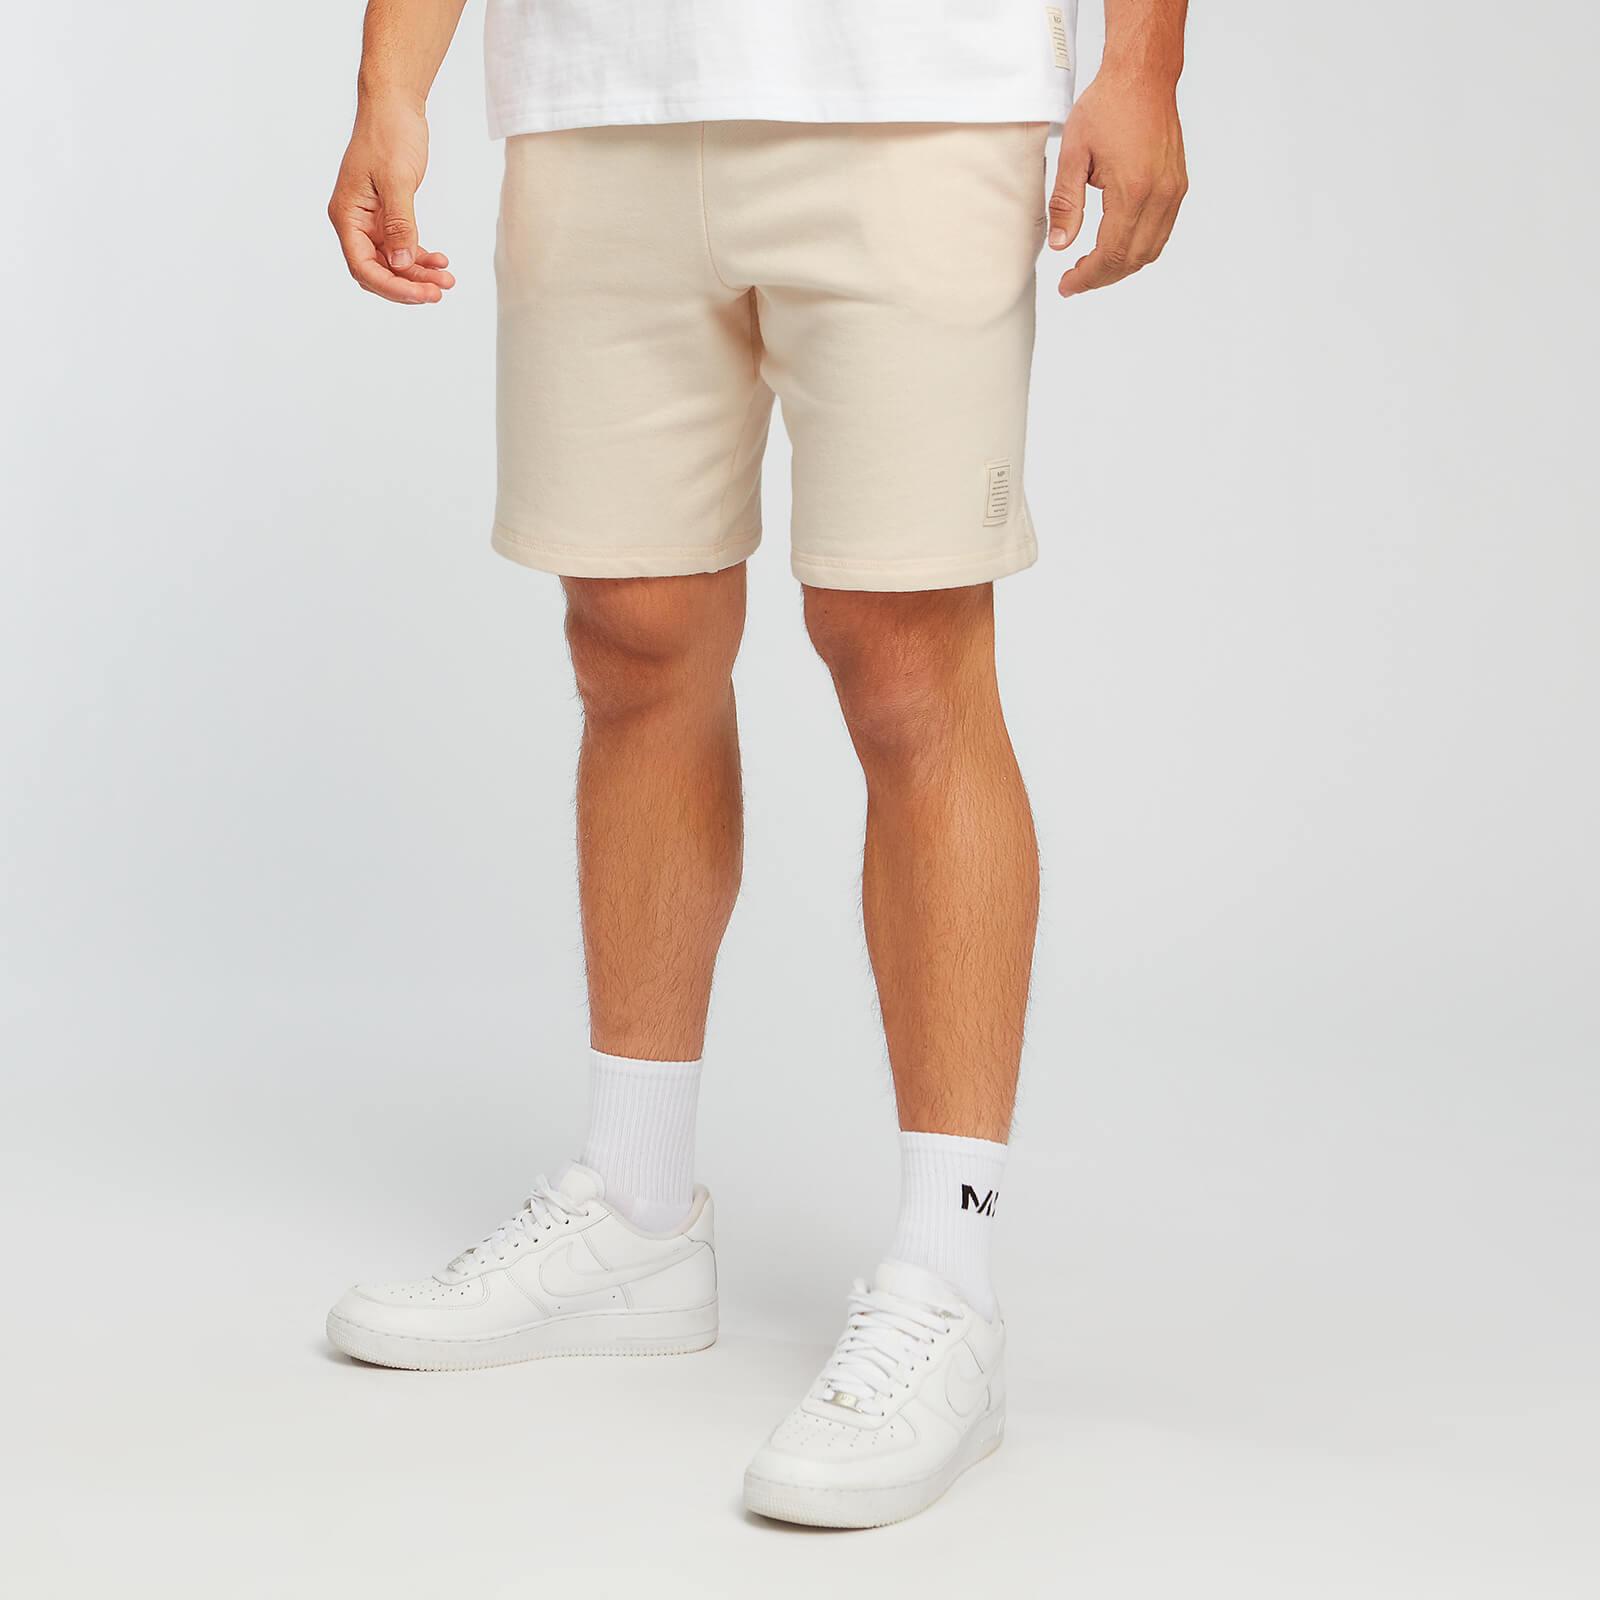 Sweats A / WEAR – Crème - XL